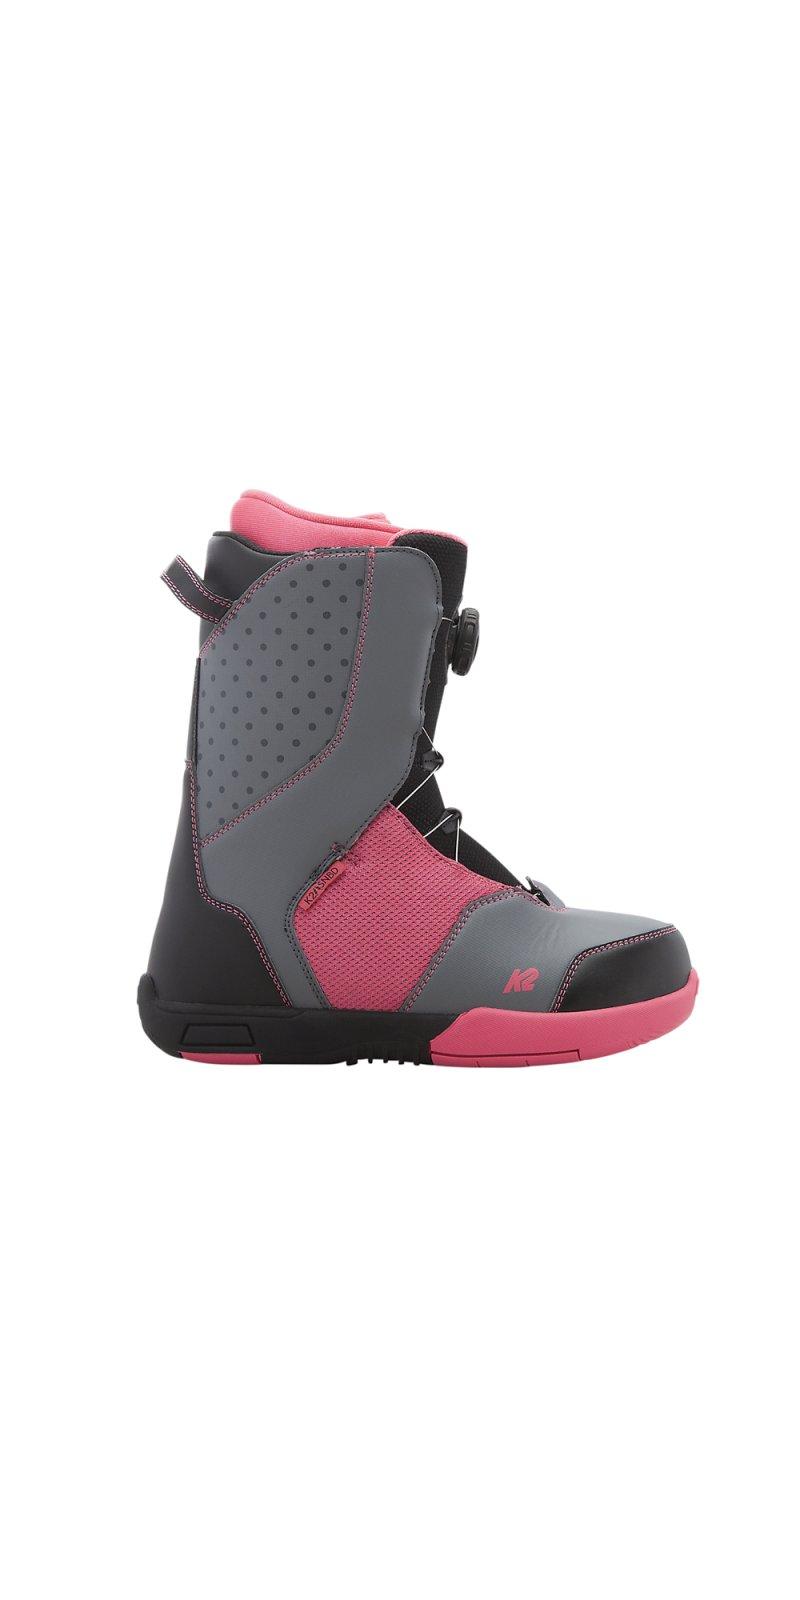 17/18 K2 Kat Snowboard Boots